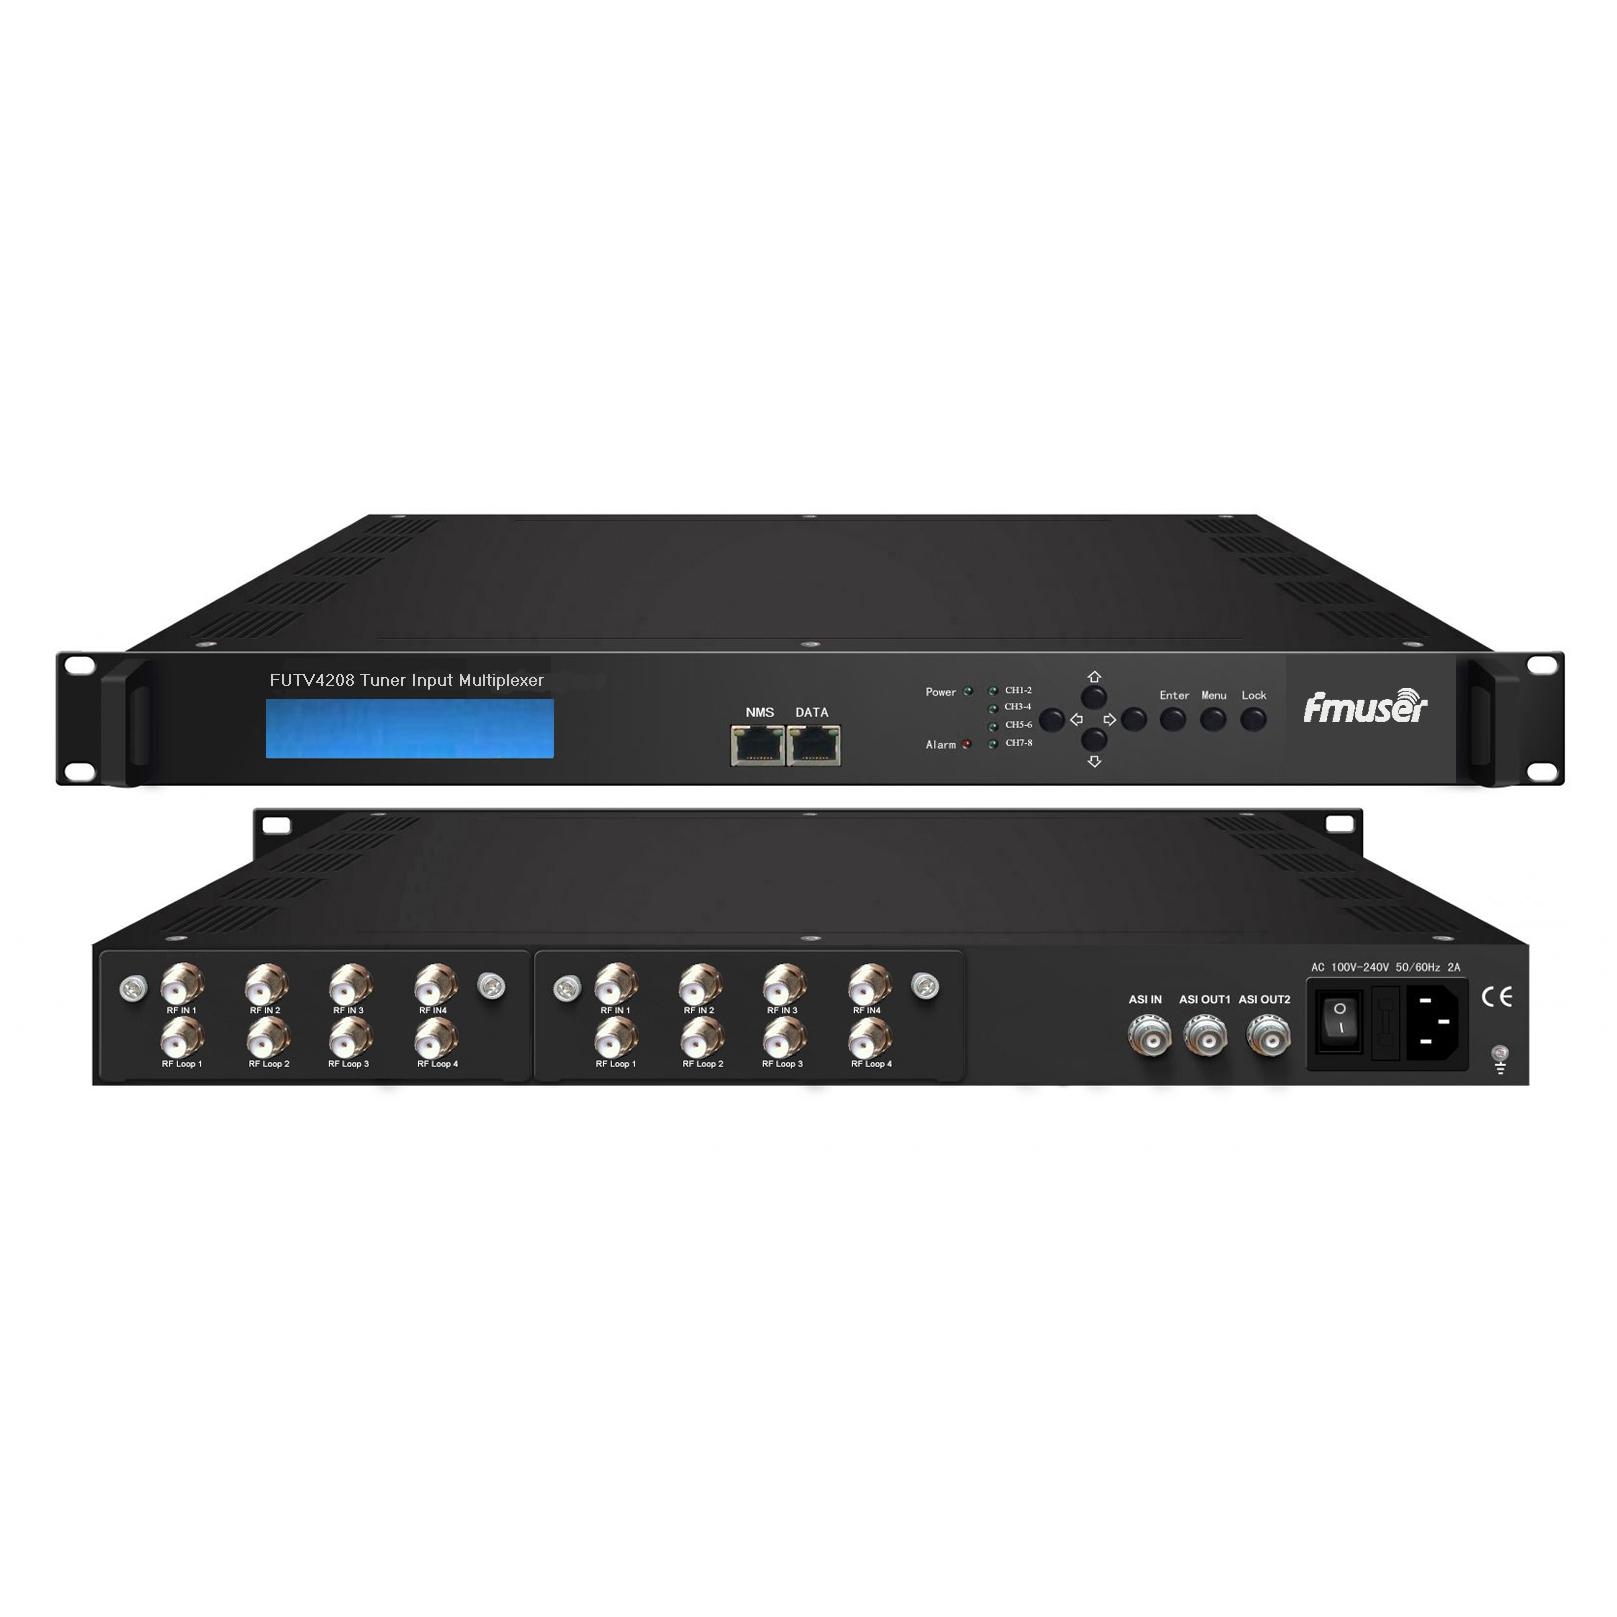 FMUSER FUTV4208 8 Tuner IRD (8 DVB-S2 / T RF Input, 1 ASI In, 2 ASI 1 IP Output) Multiplexer